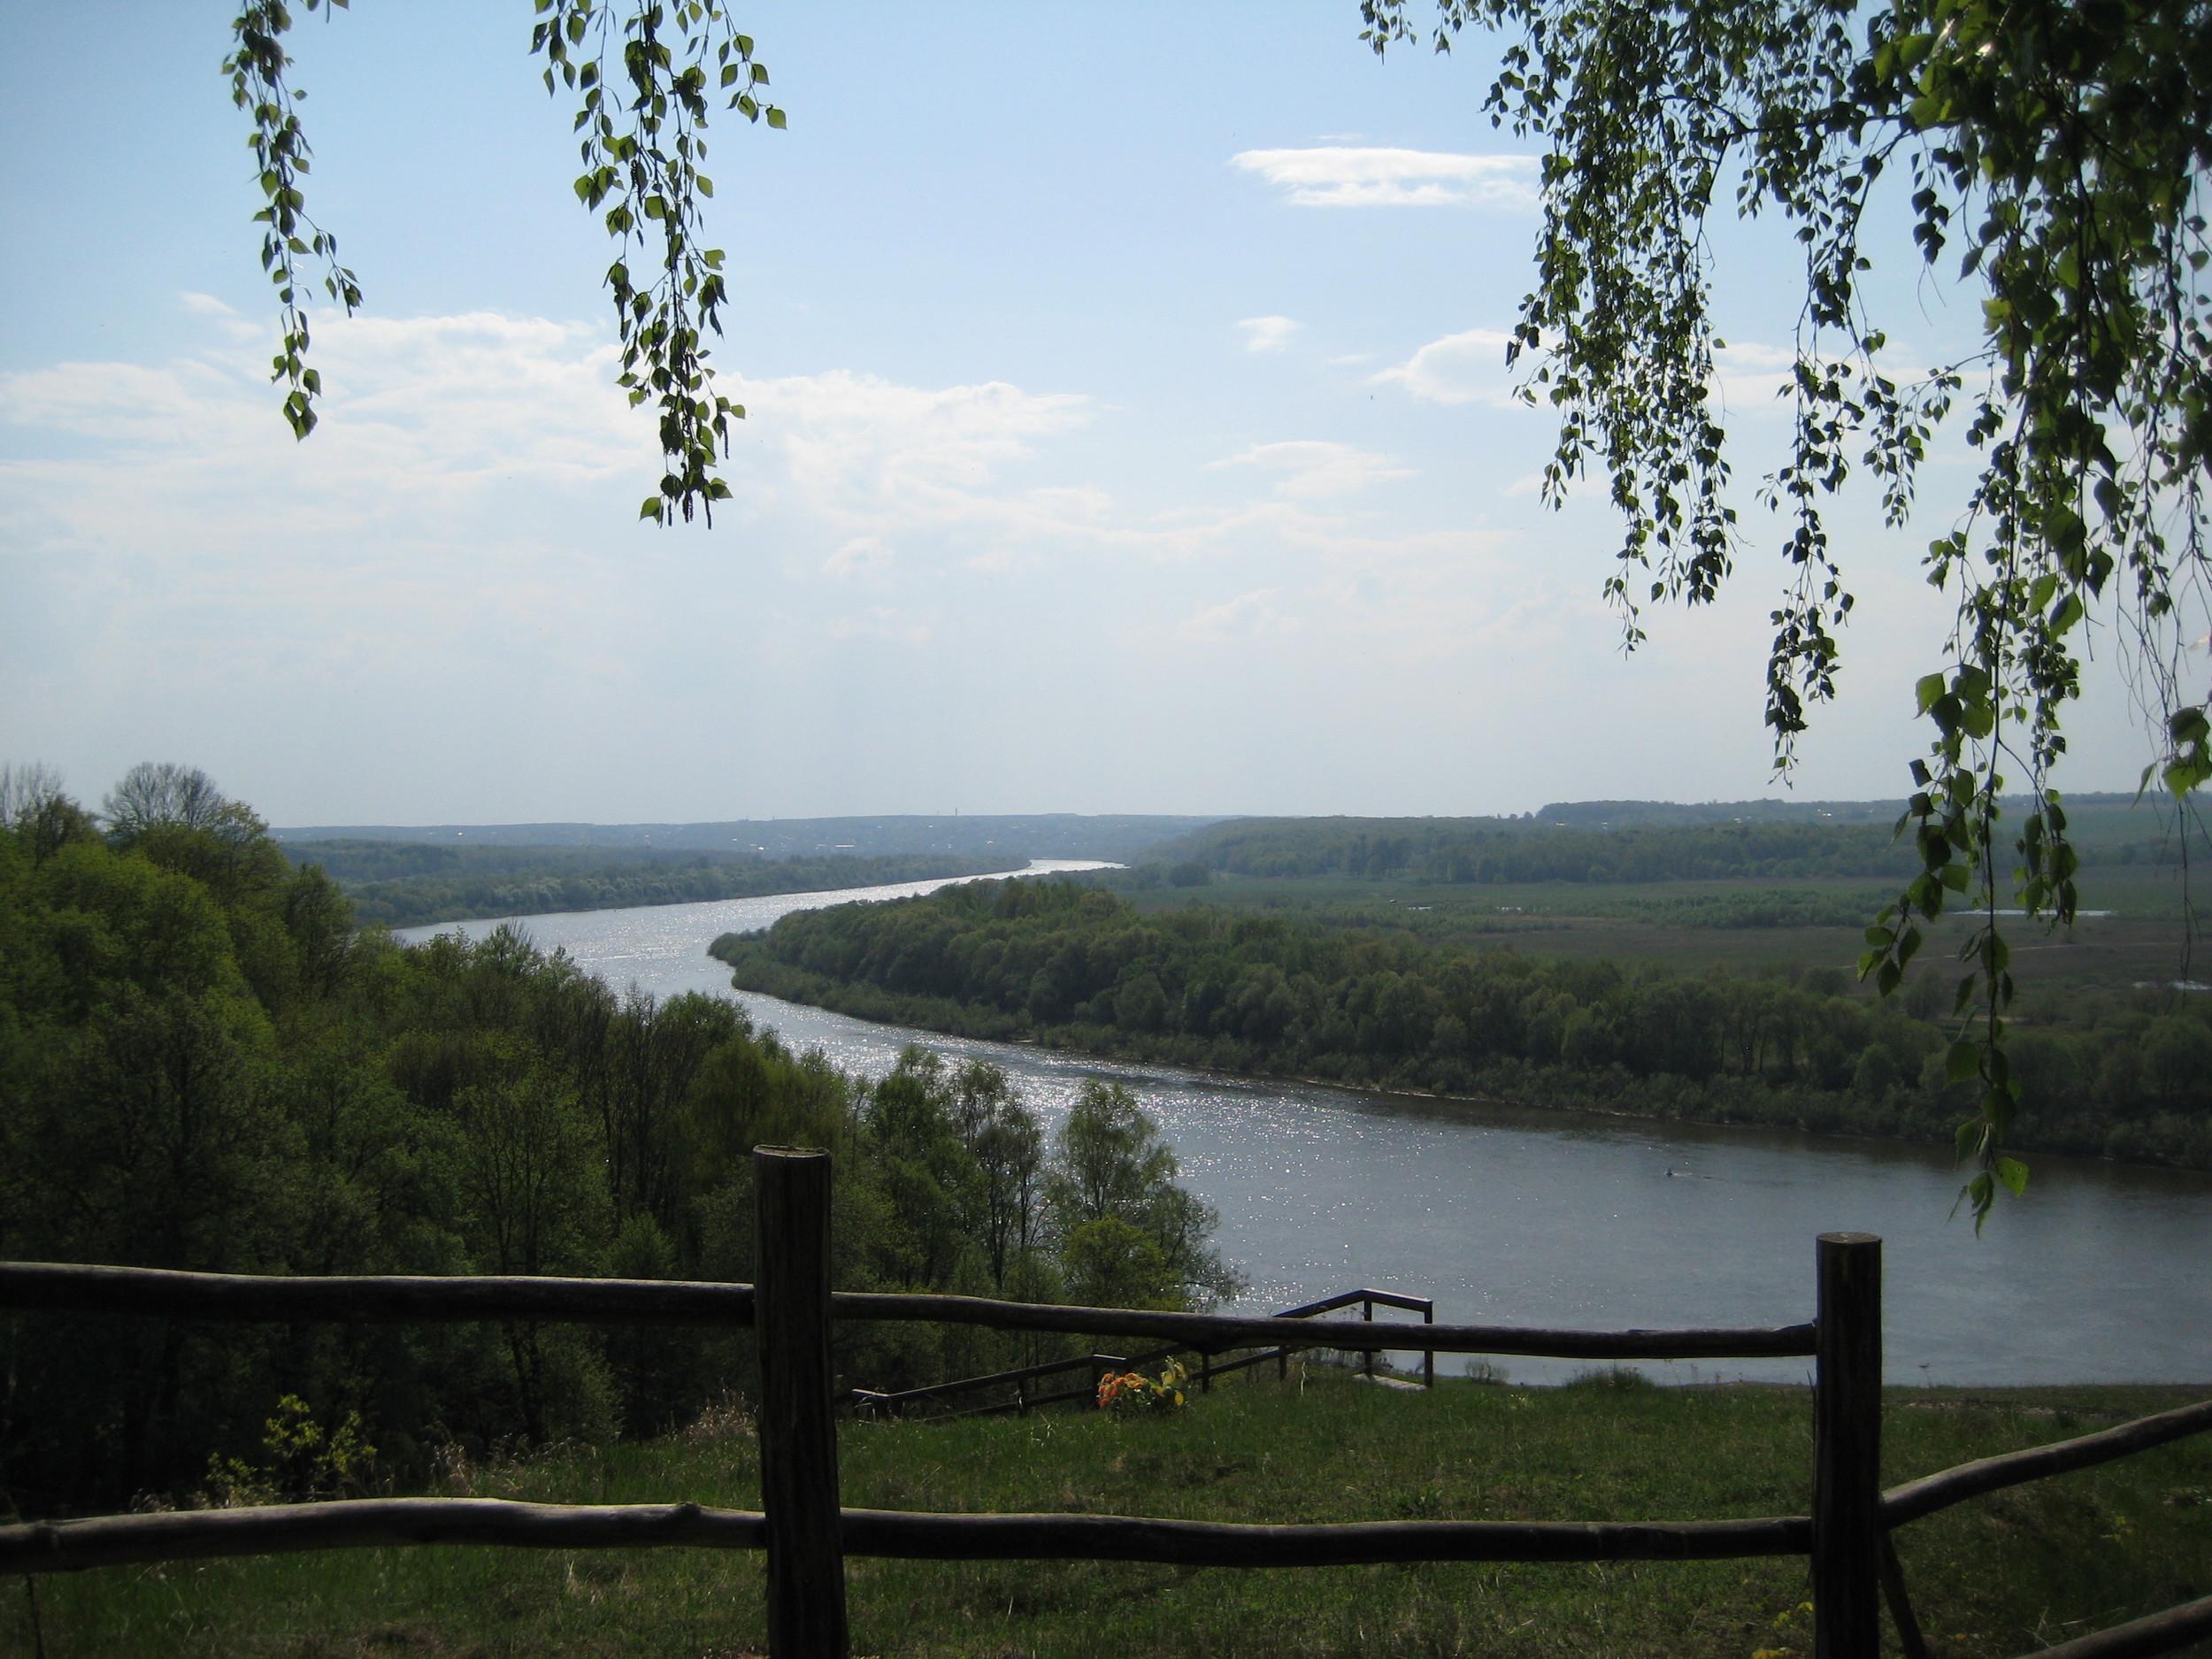 oka-river-from-near-the-church